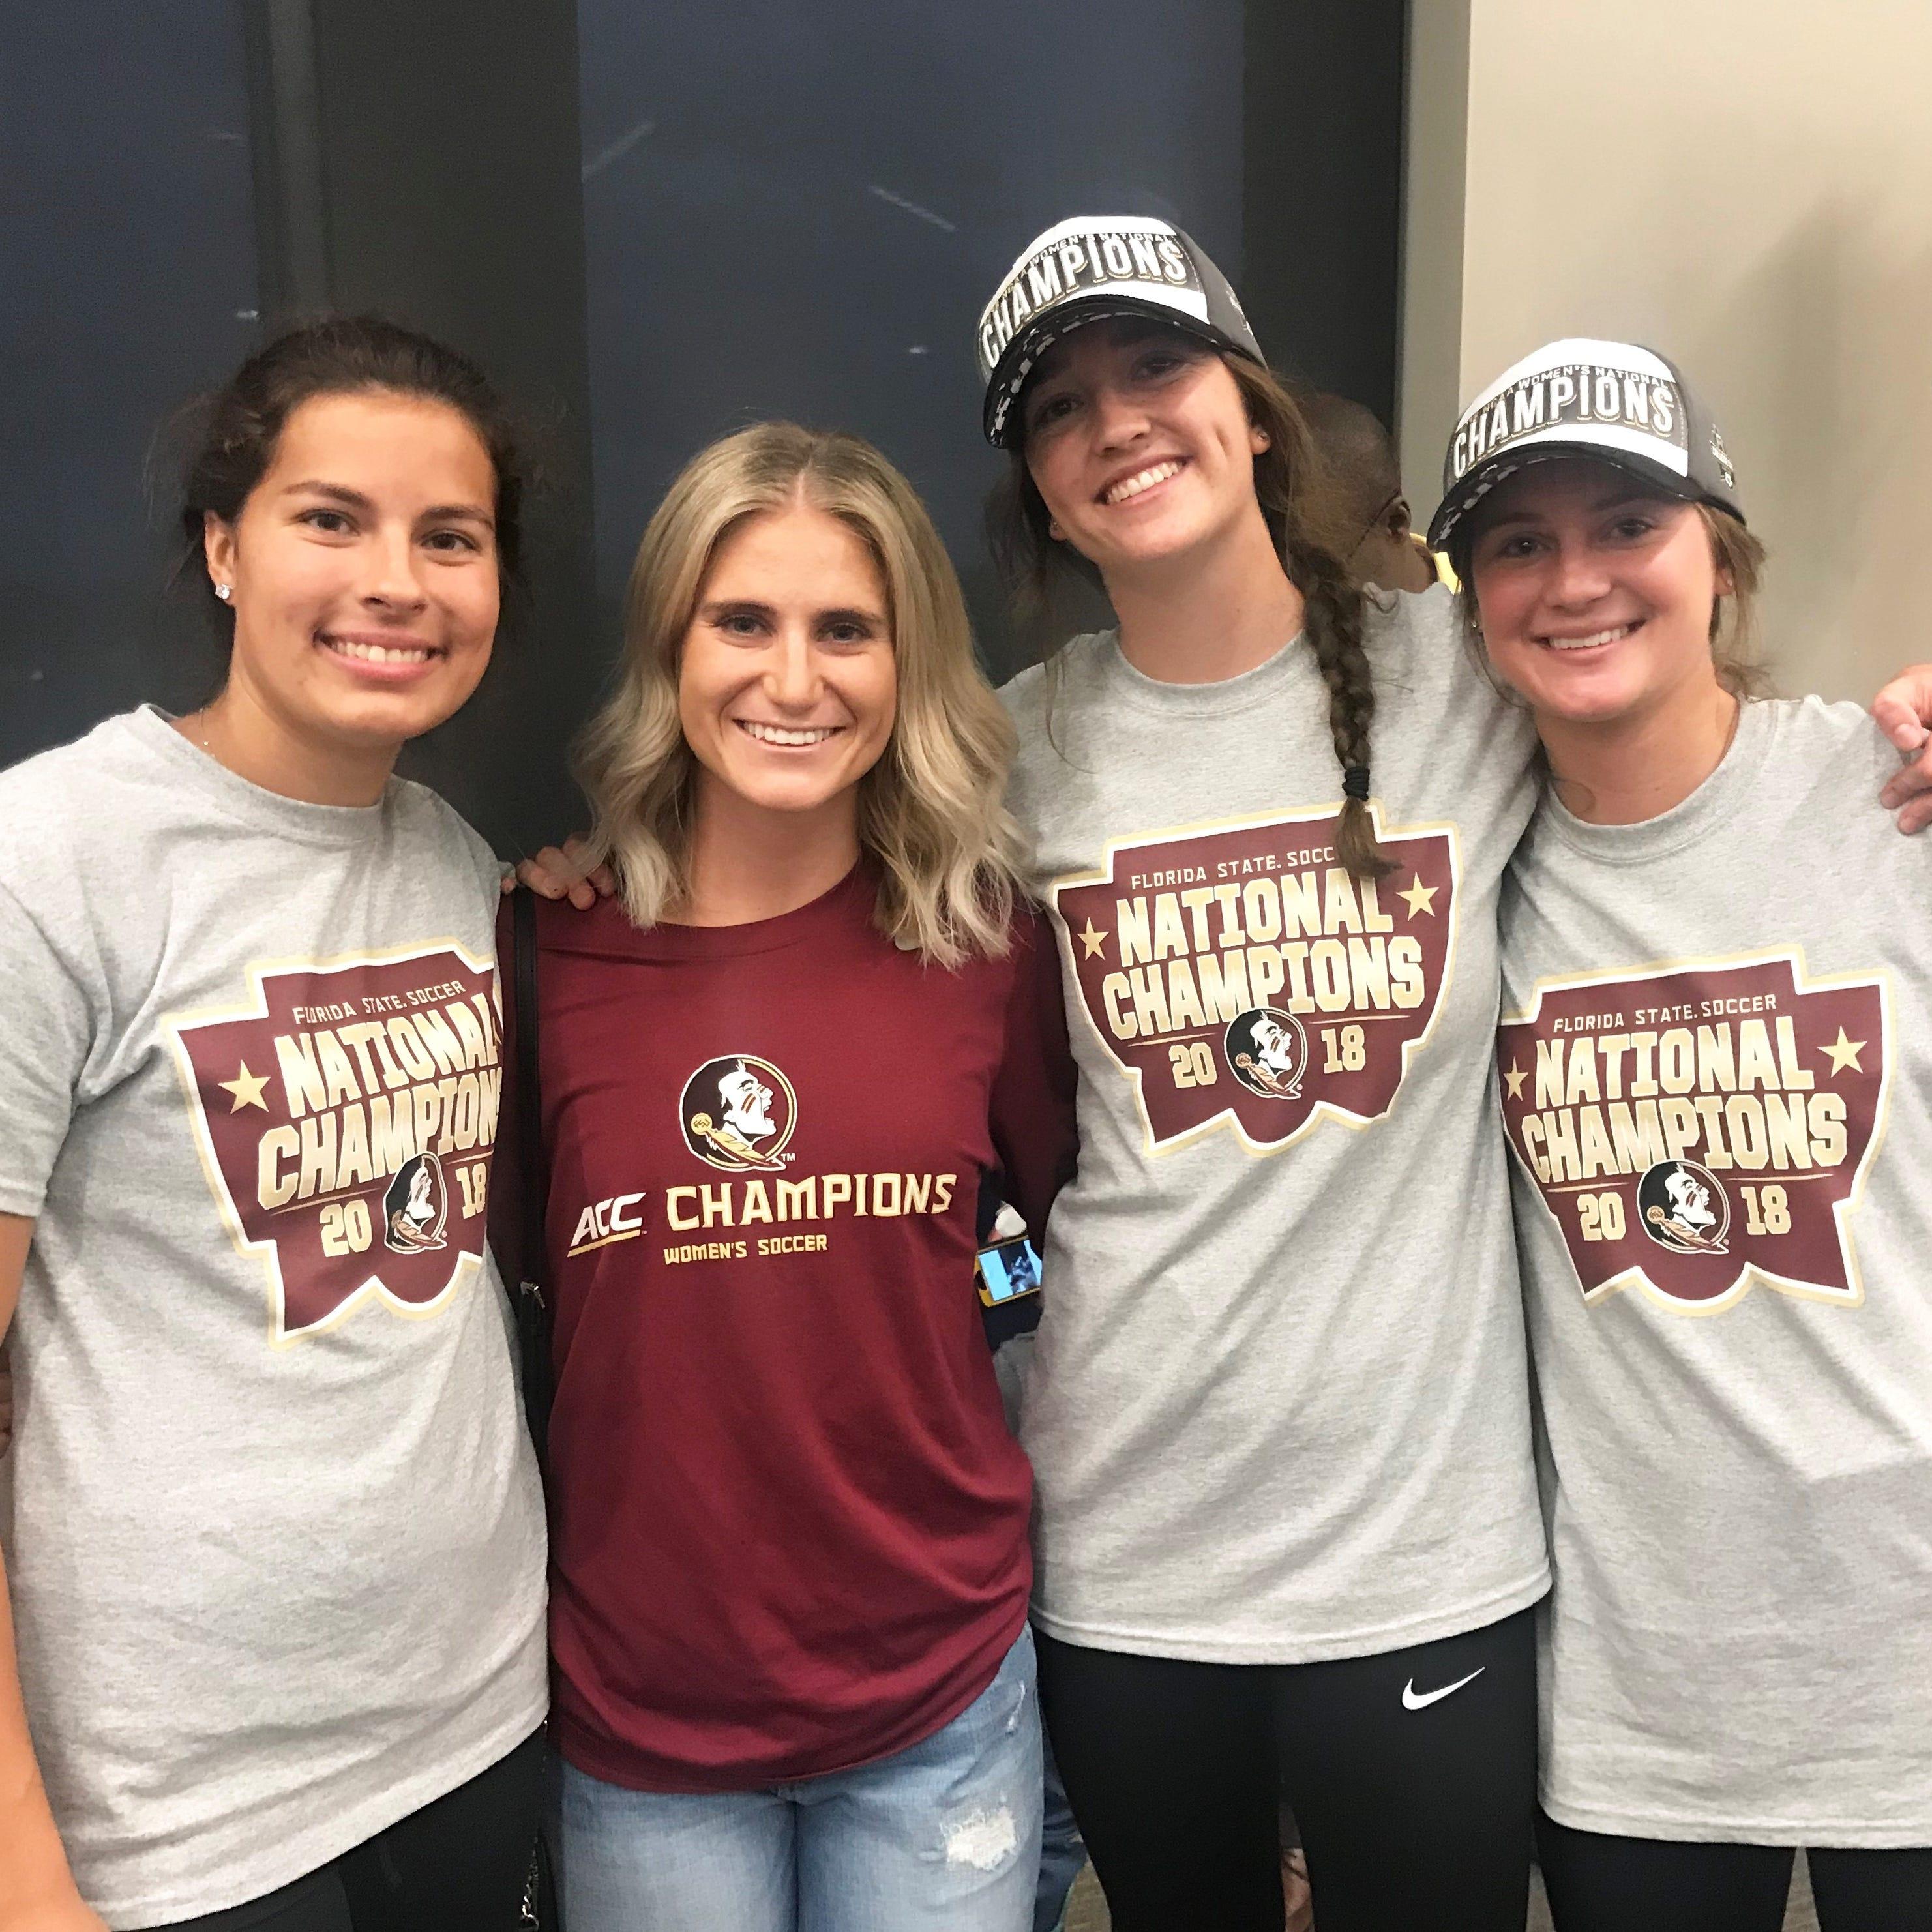 Michaela Hahn's mentoring key to FSU's soccer championship